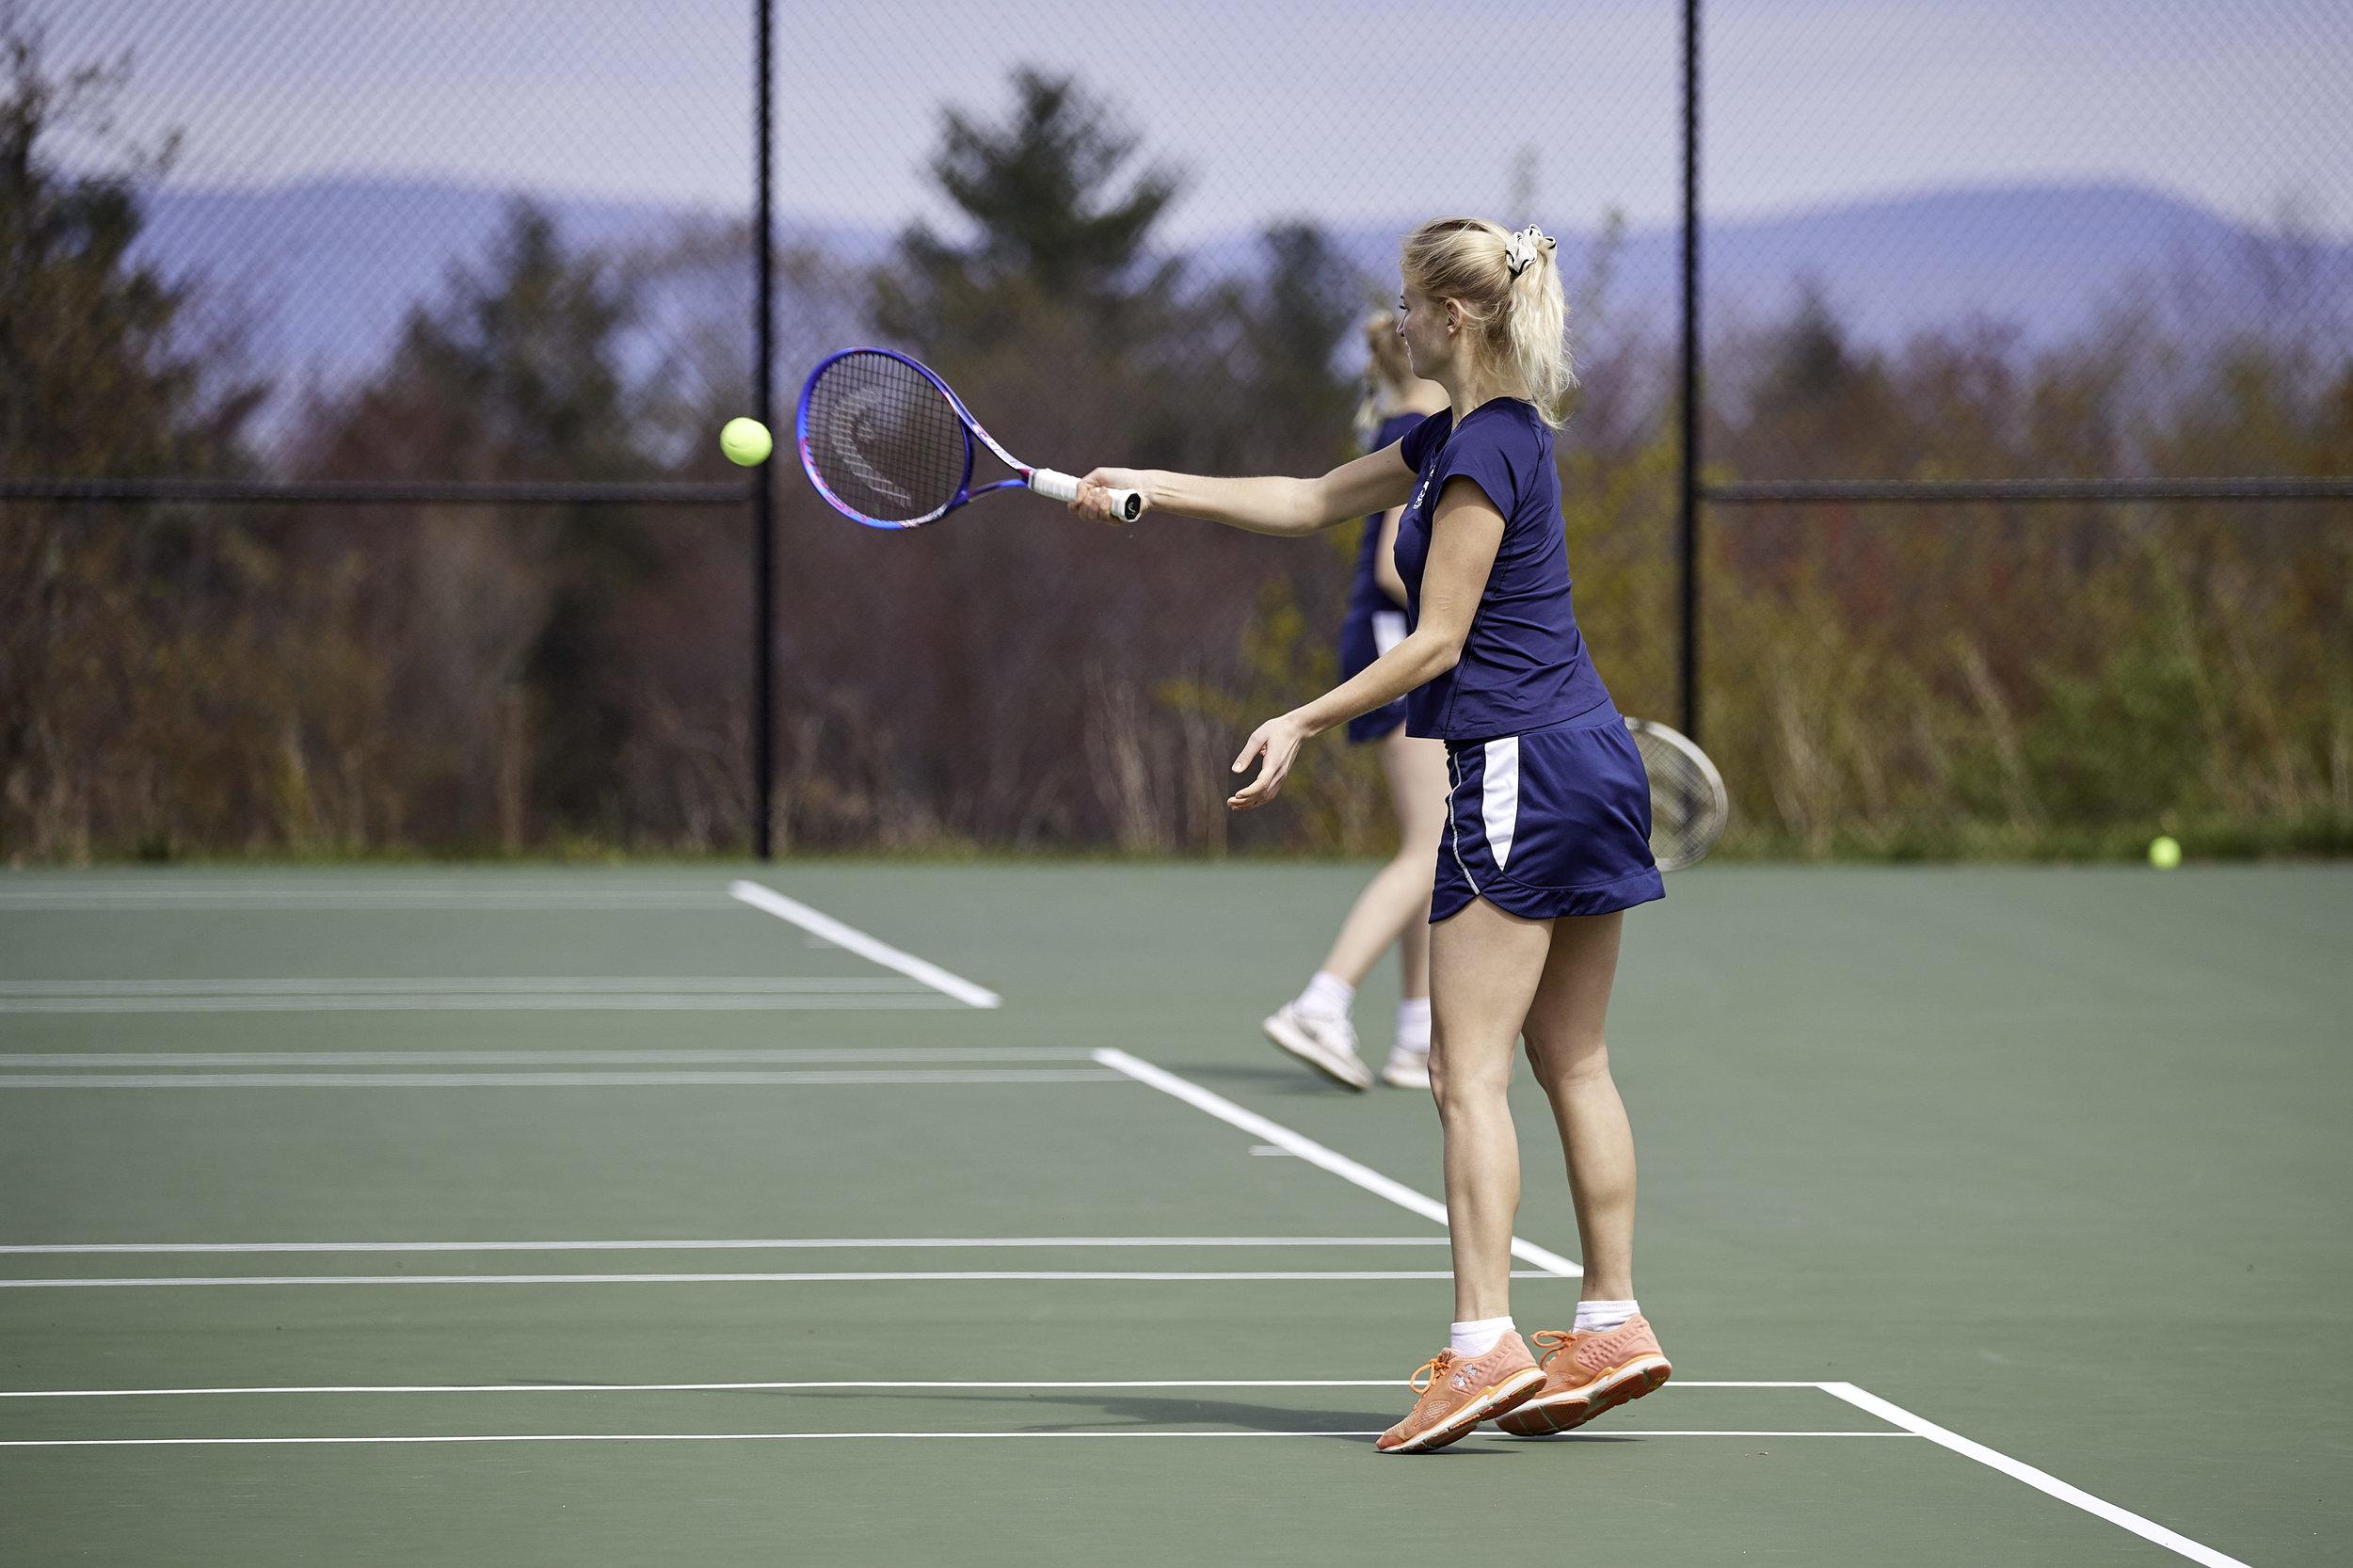 Girls Tennis vs. Winchendon School - May 15, 2019 -195170.jpg